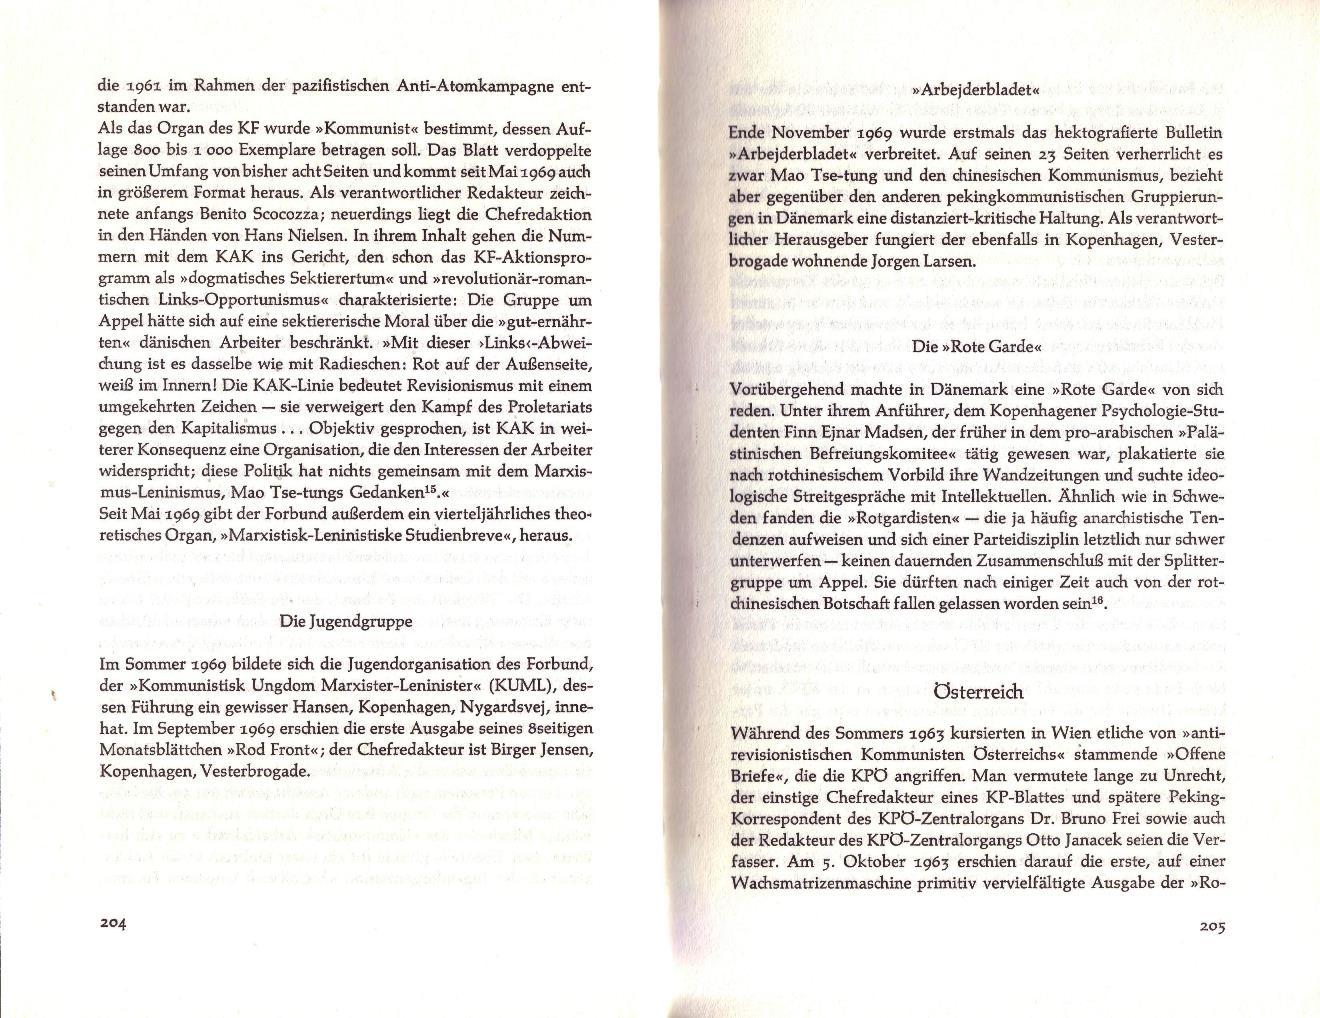 Schlomann_Friedlingstein_Die_Maoisten_0106